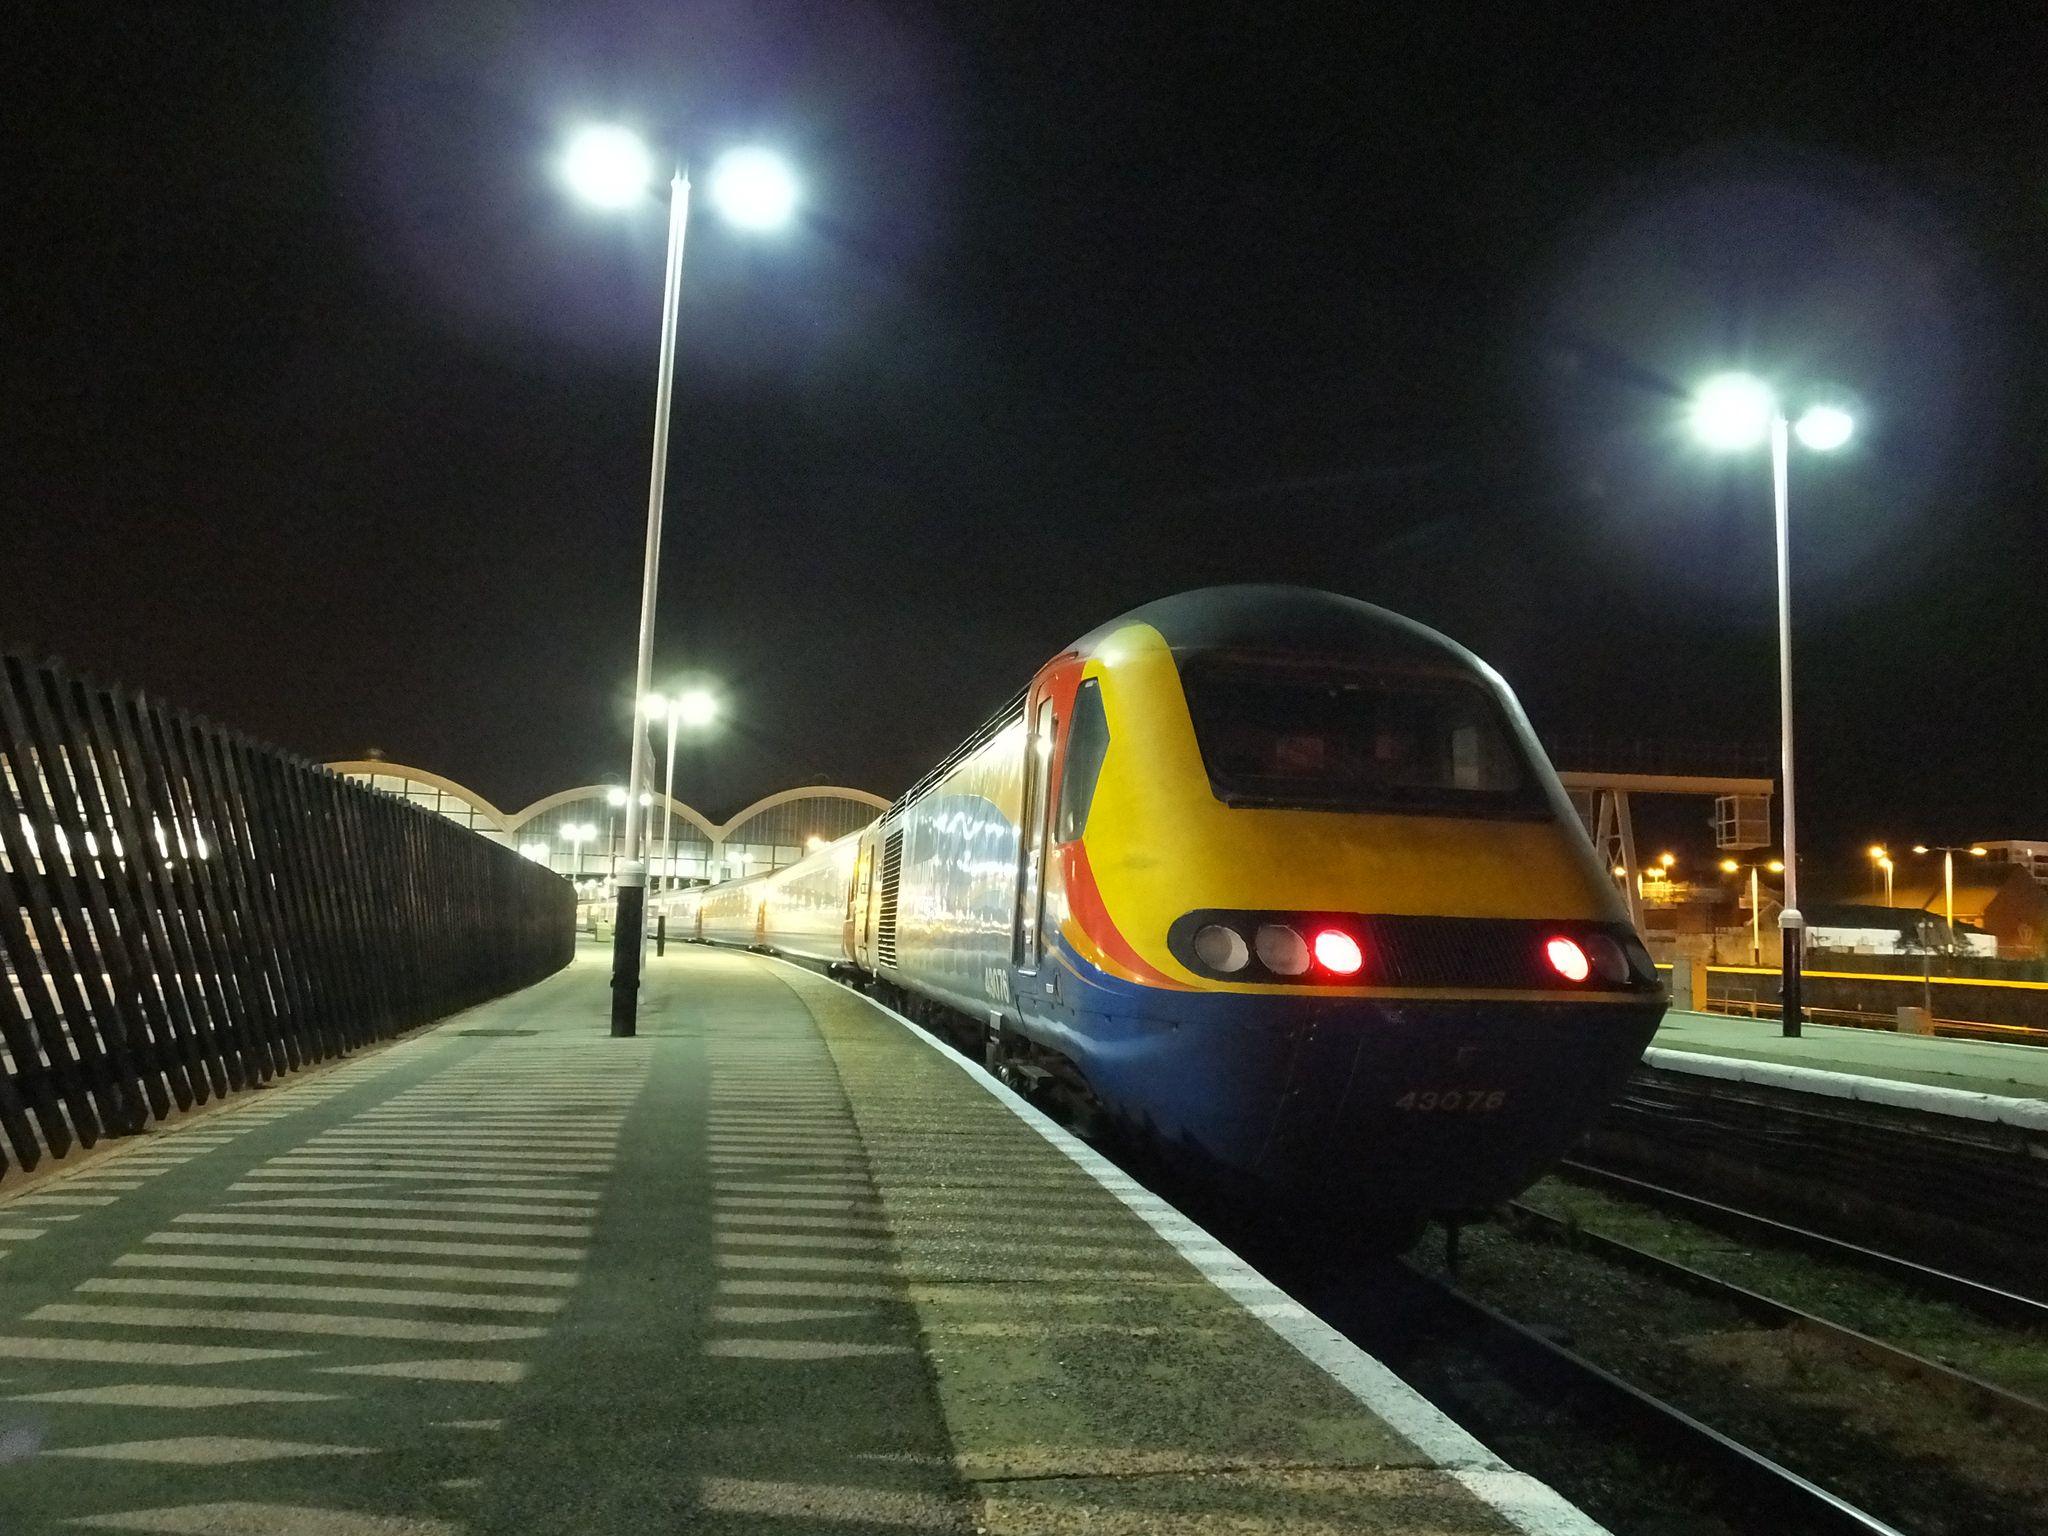 43076 Hull Railway Station Railway Station Train Railway